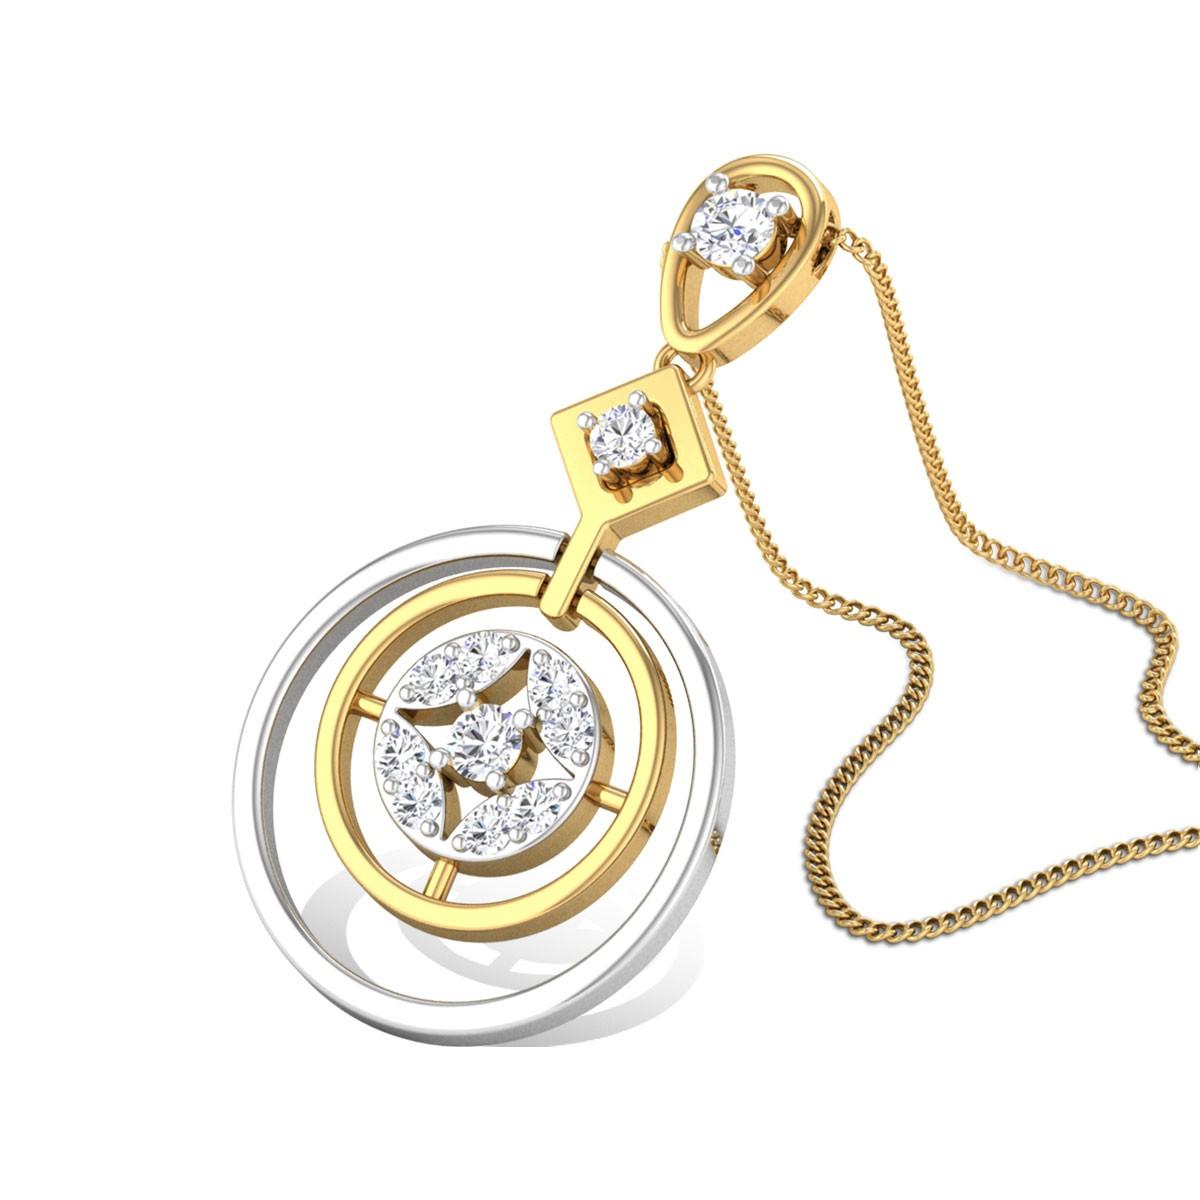 Pastle Shine Diamond Pendant